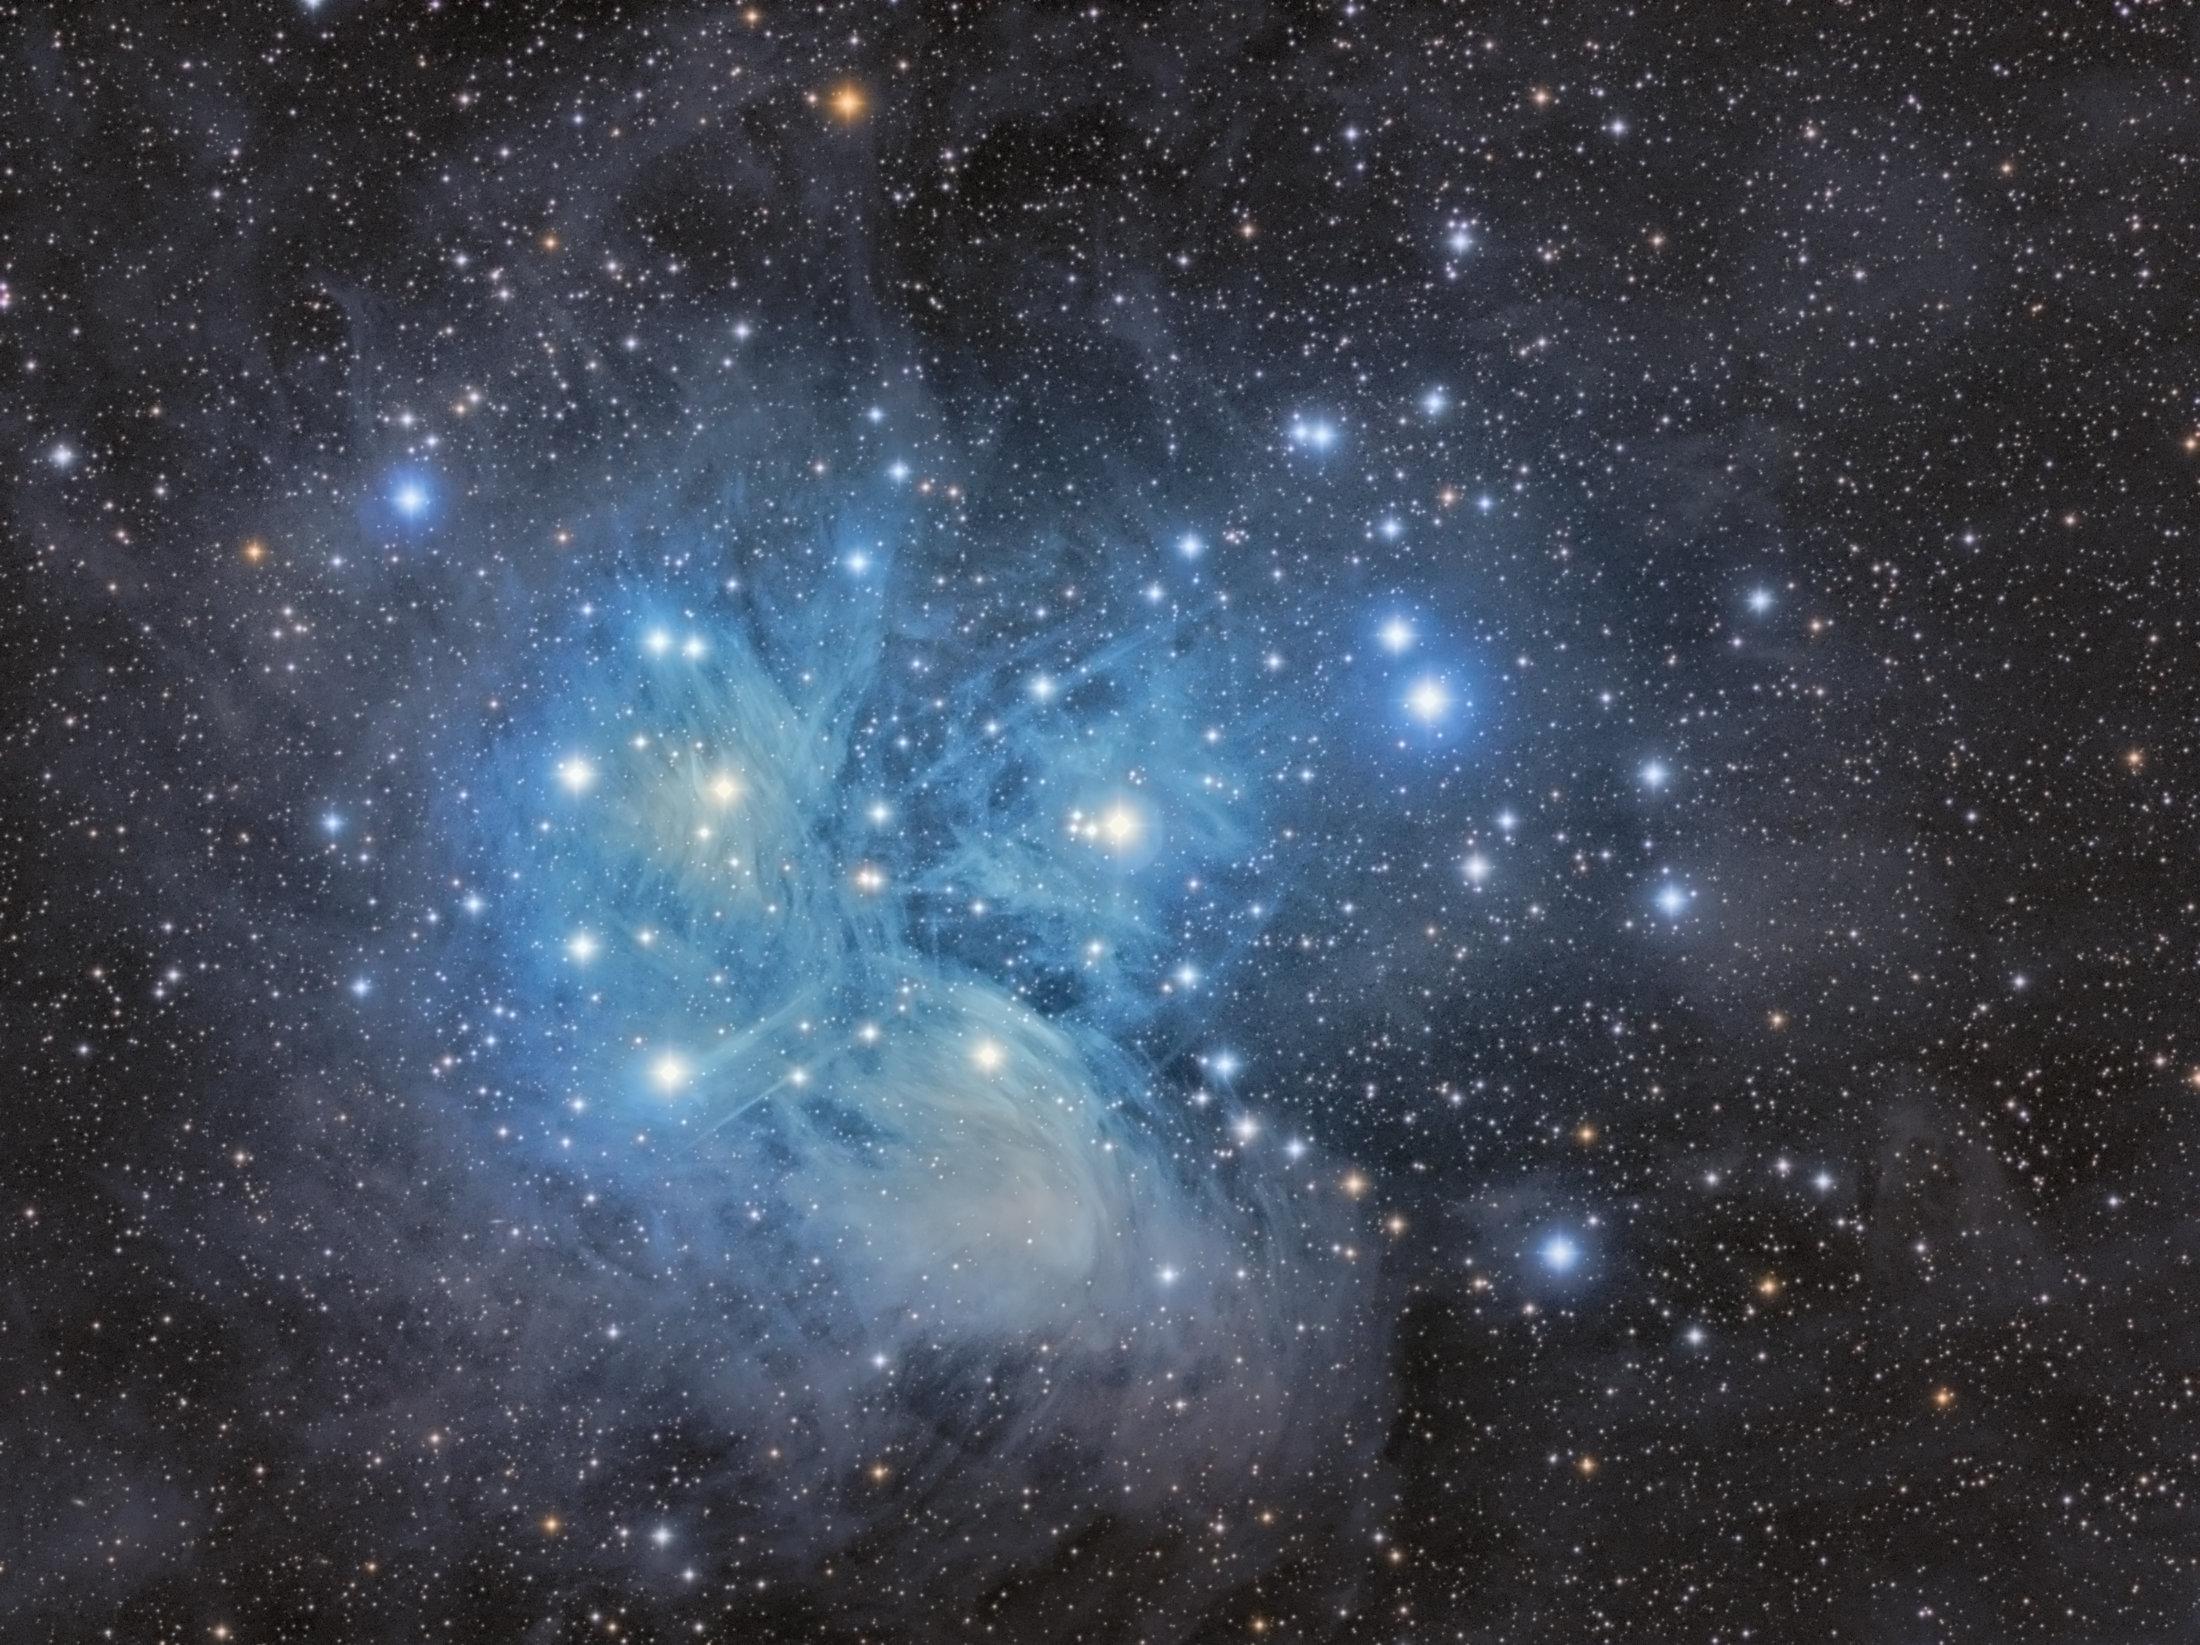 M45 - Manel Martin